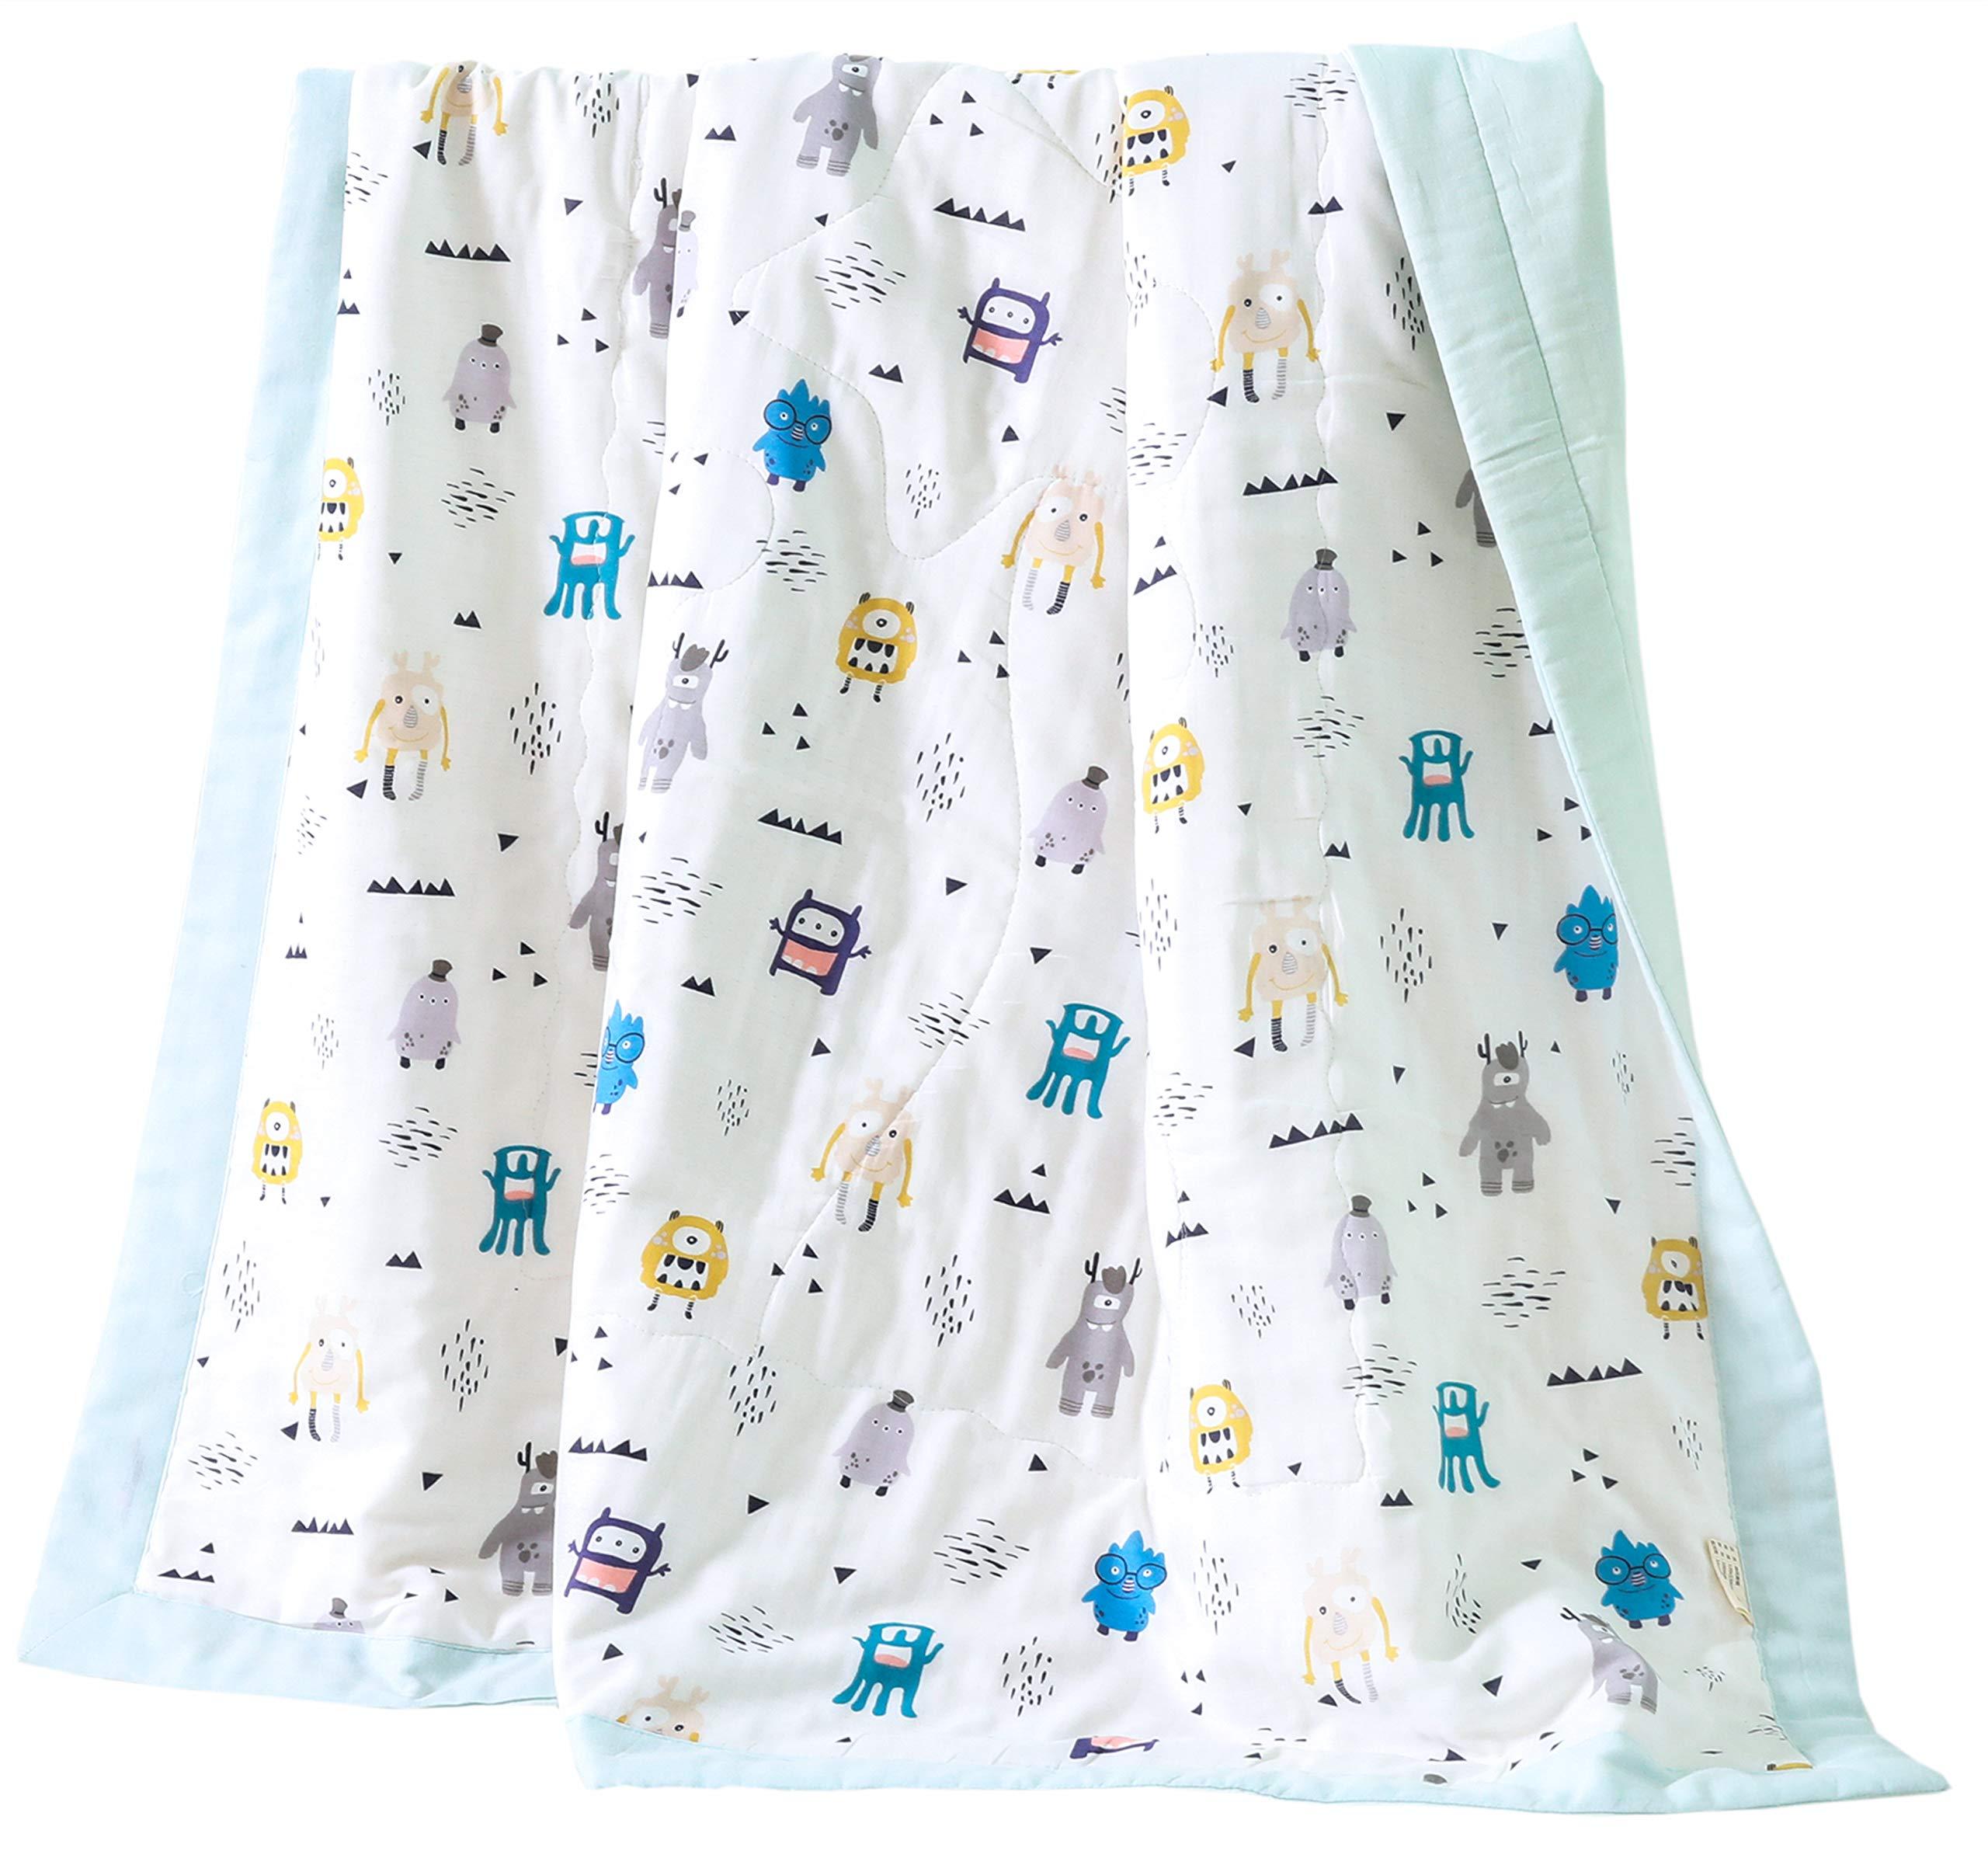 J-pinno Boys & Girls Cute Alien Robot Muslin Quilt Comforter Bedding Coverlet, 100% Long Staple Cotton, Throw Blanket Twin for Kid's Bedroom Decoration Gift (Twin 59'' X 78'', Robot)